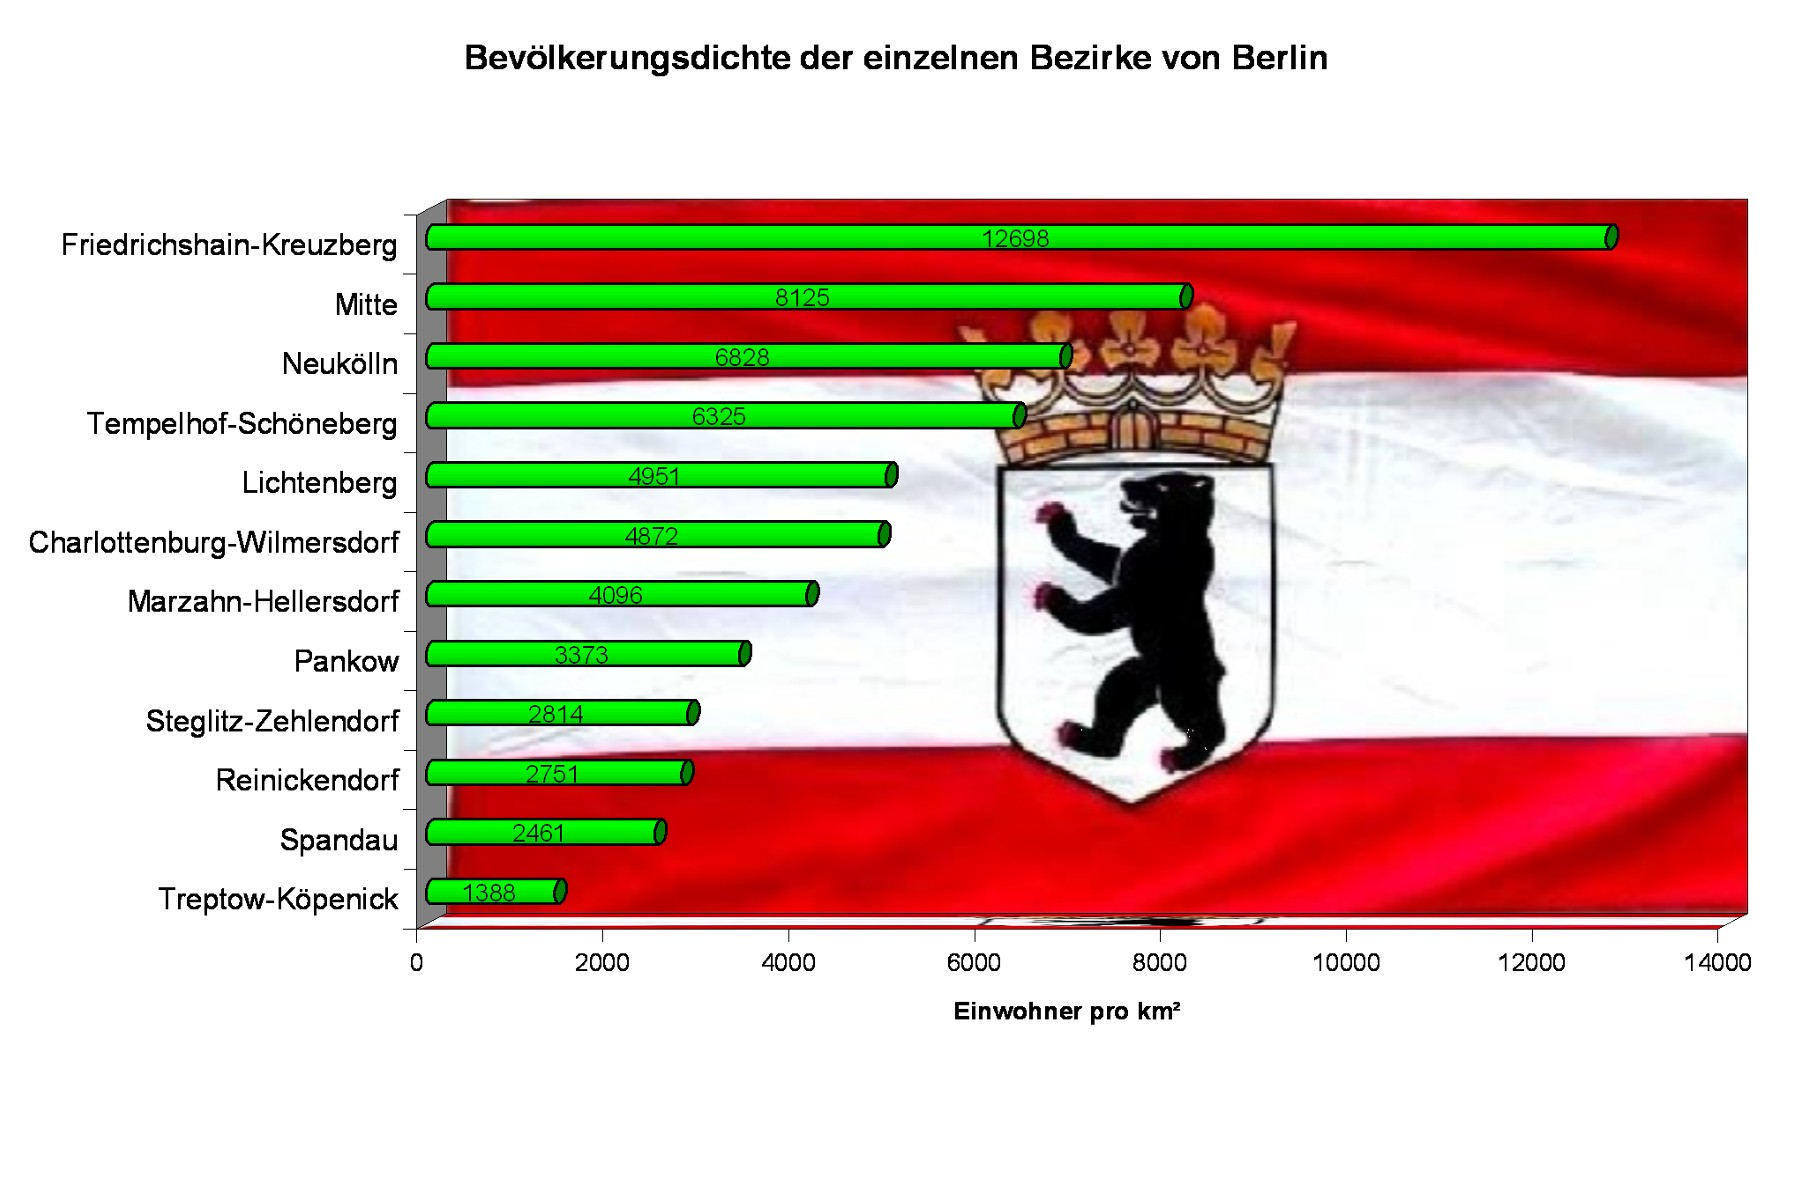 Datei:Berlin, Einwohner pro quadratkilometer.jpg